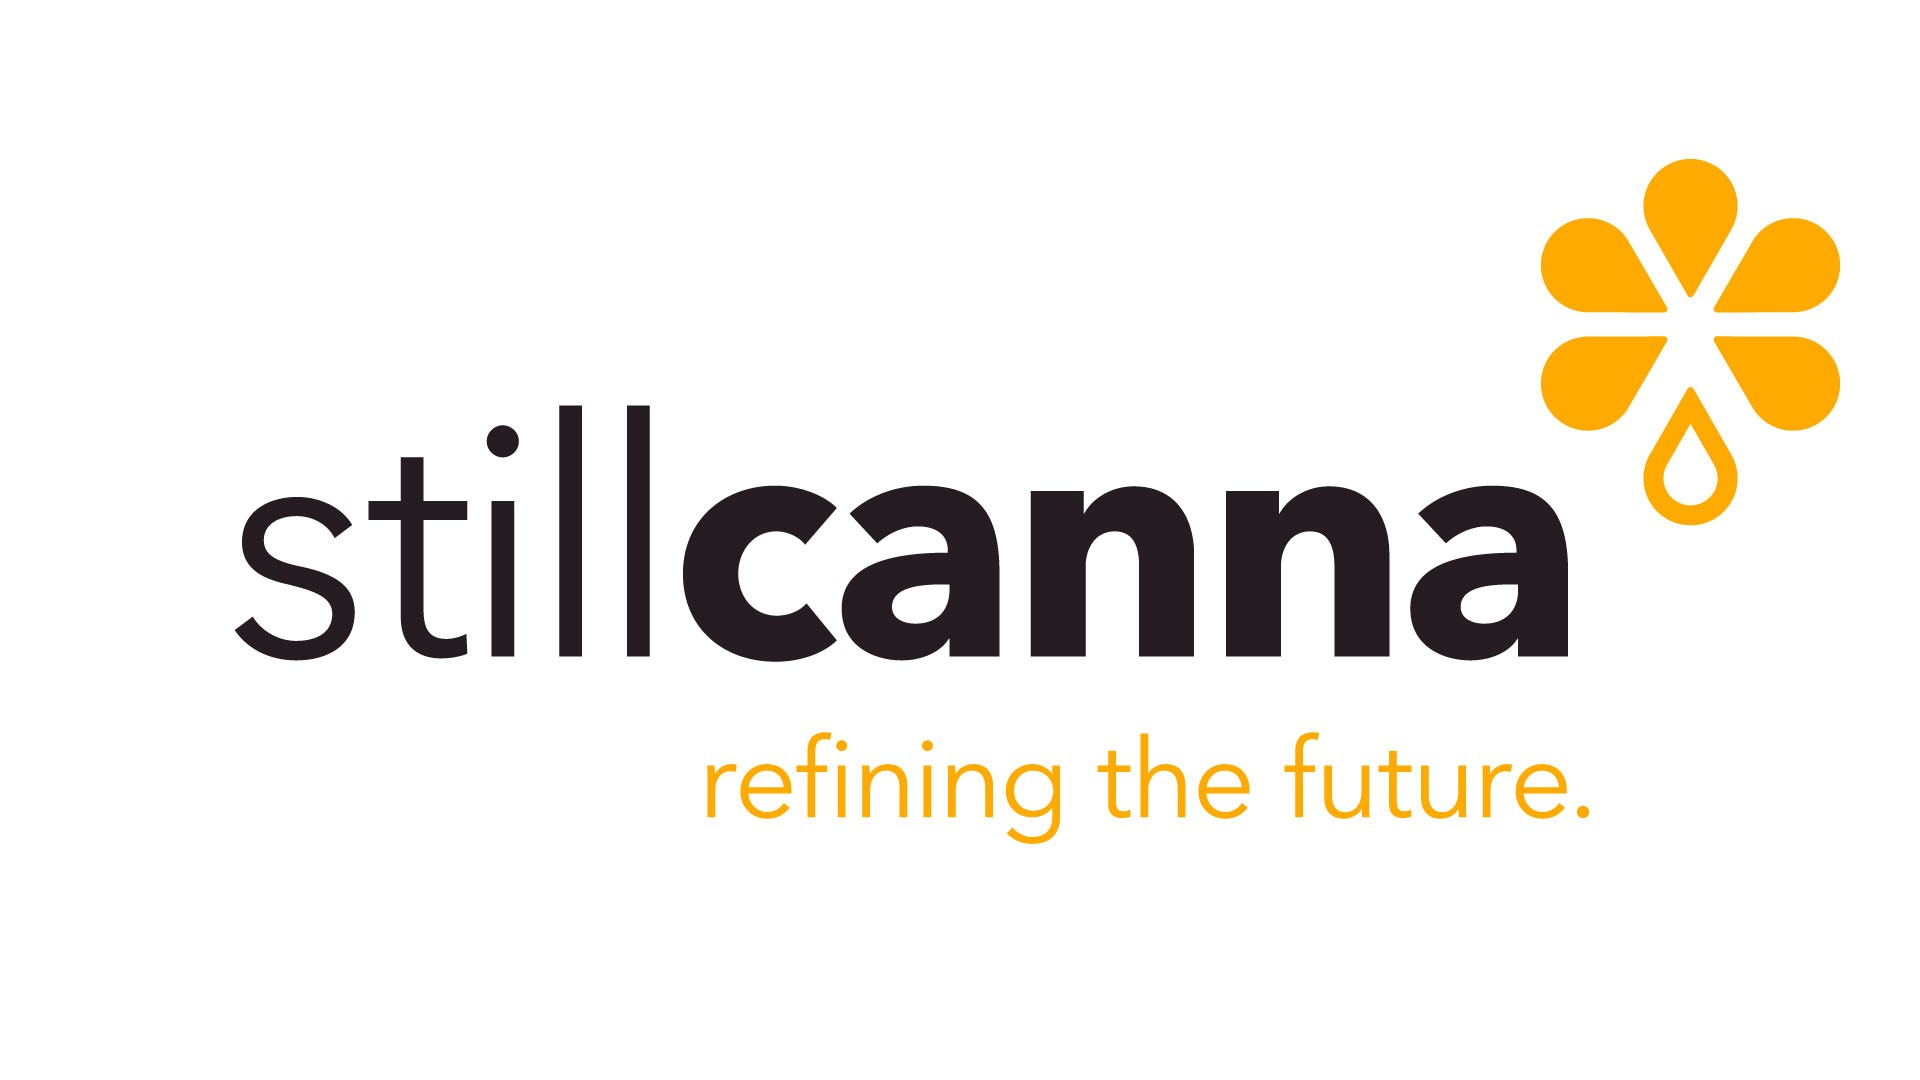 Stillcanna signs Definitive Agreement to Supply Hemp Biomass